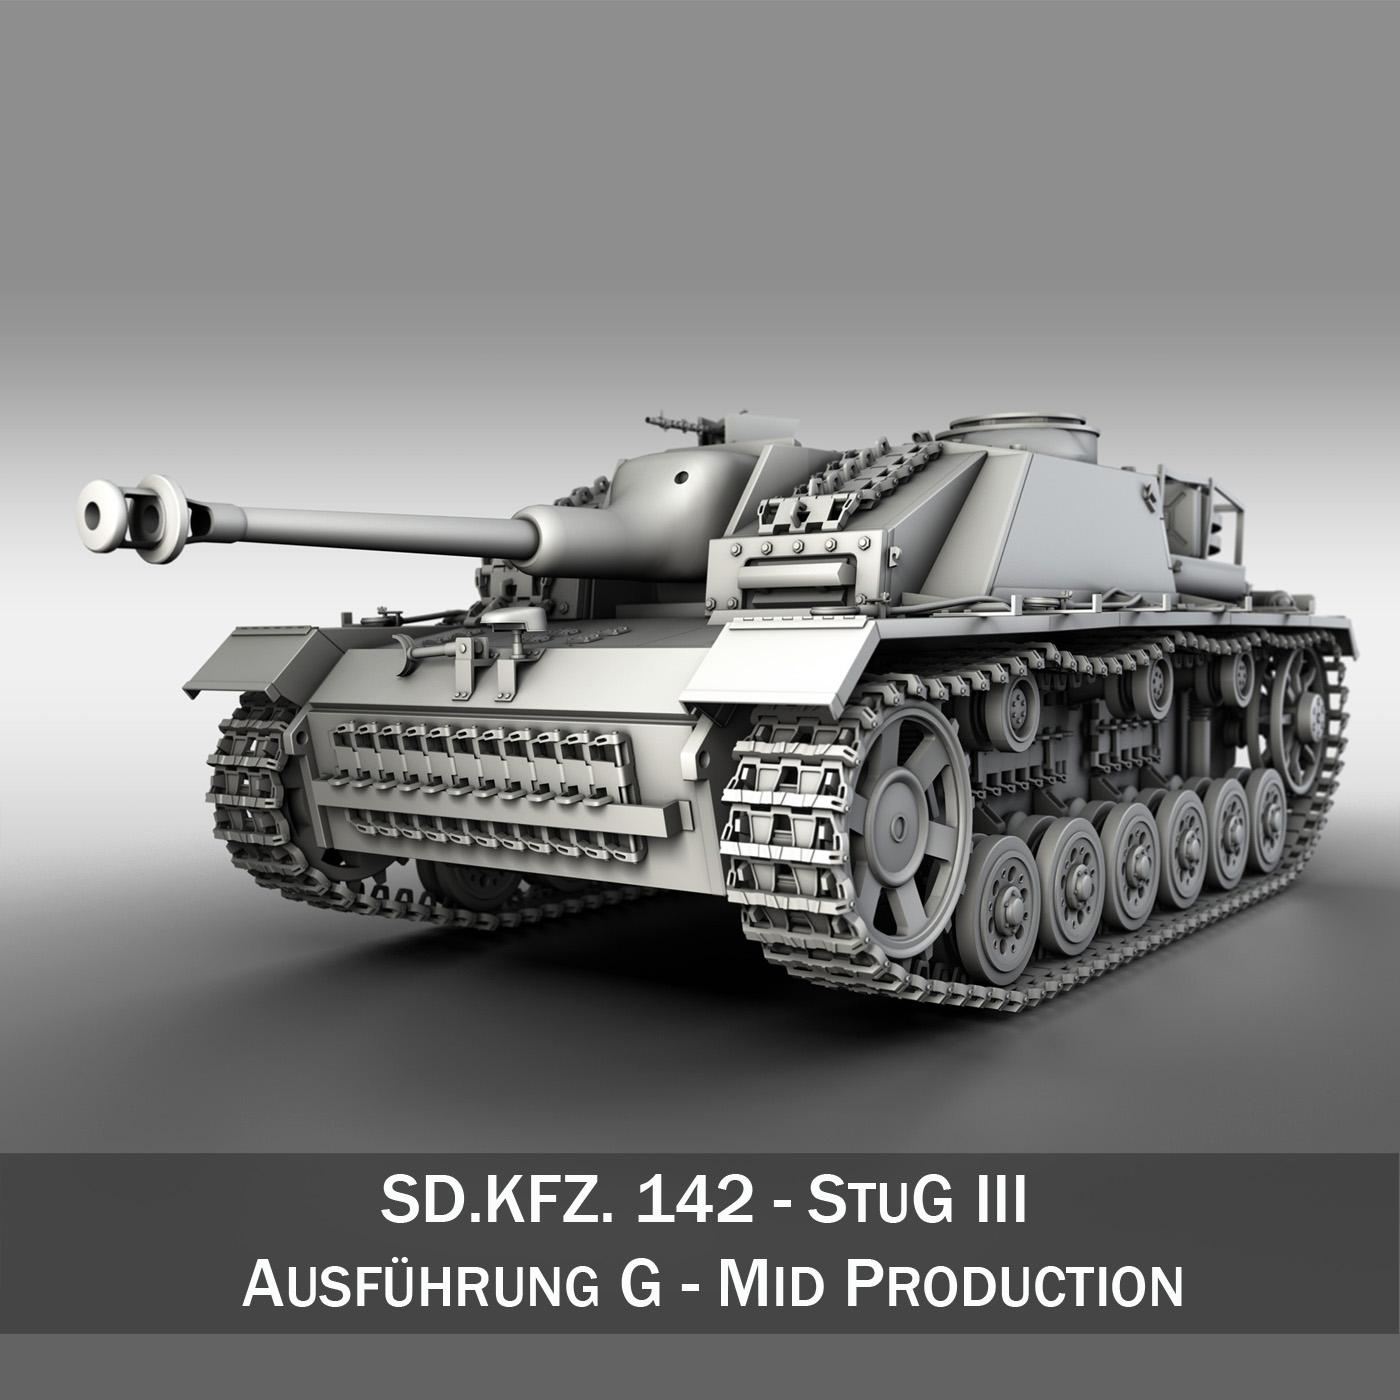 sdkfz 142 – stug iii – ausf. g – mid production 3d model 3ds fbx c4d obj 251619